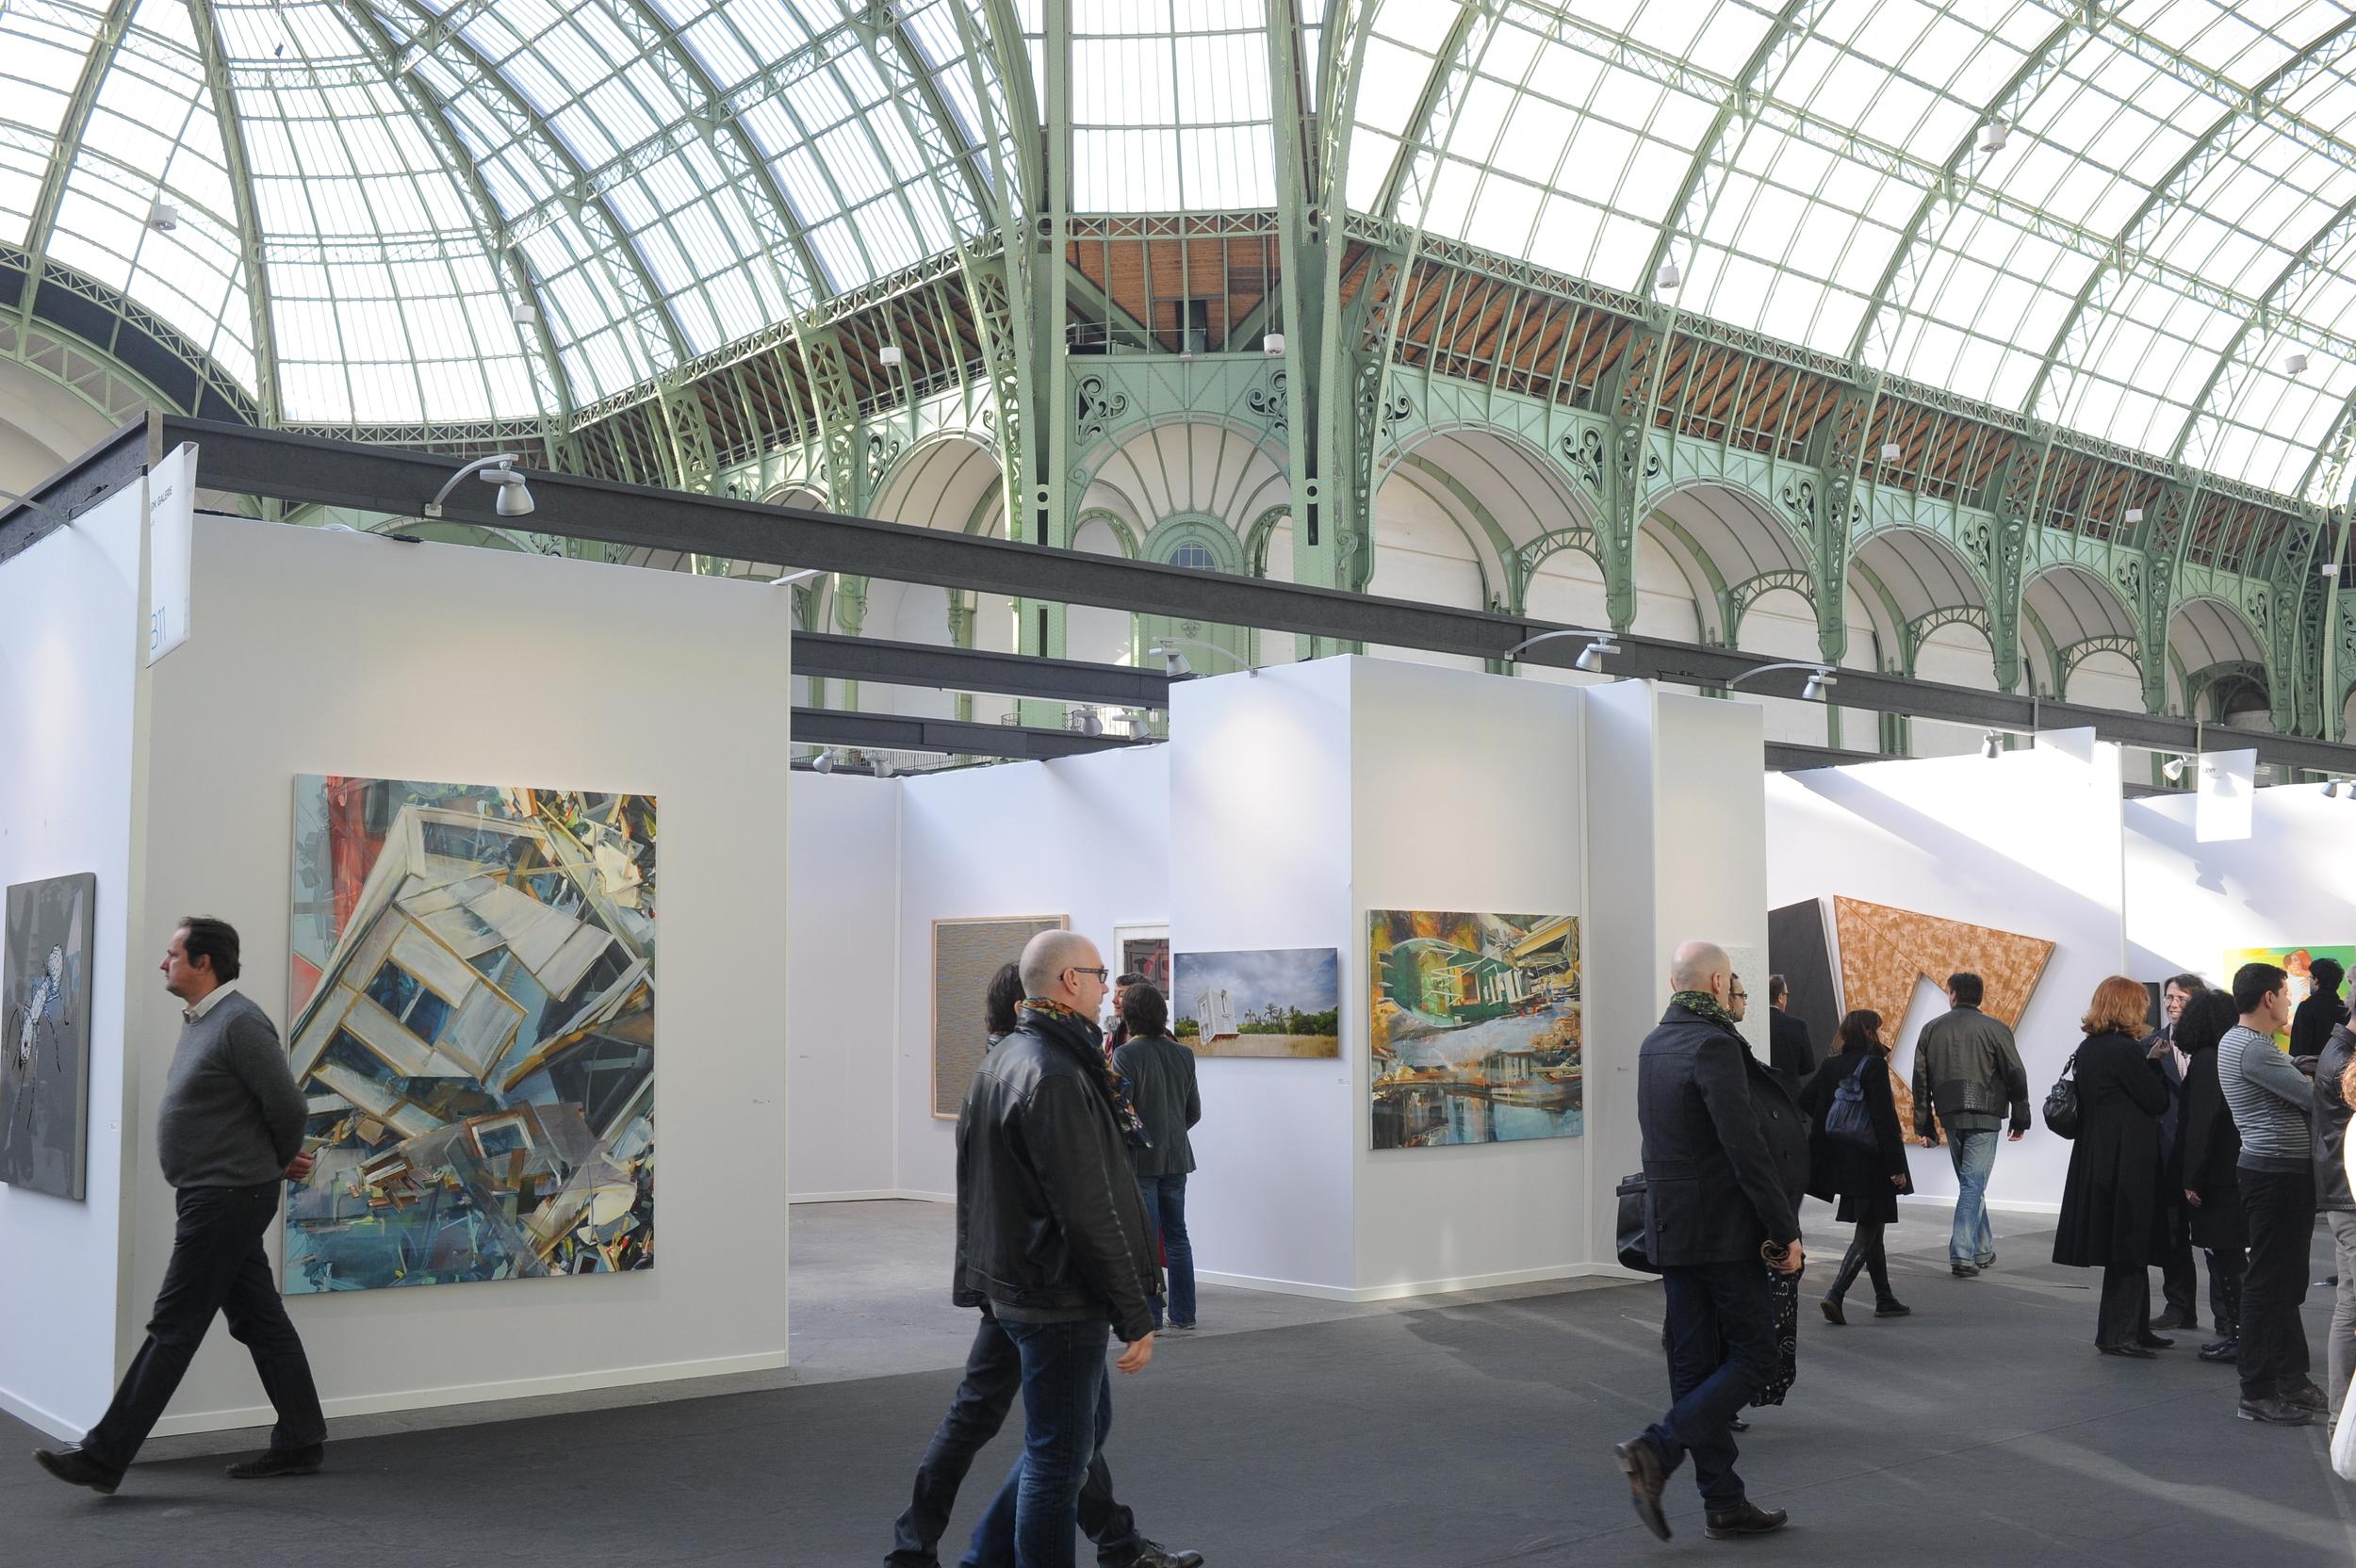 ArtParis, Grand Palais, Mitterrand Gallery, 2012